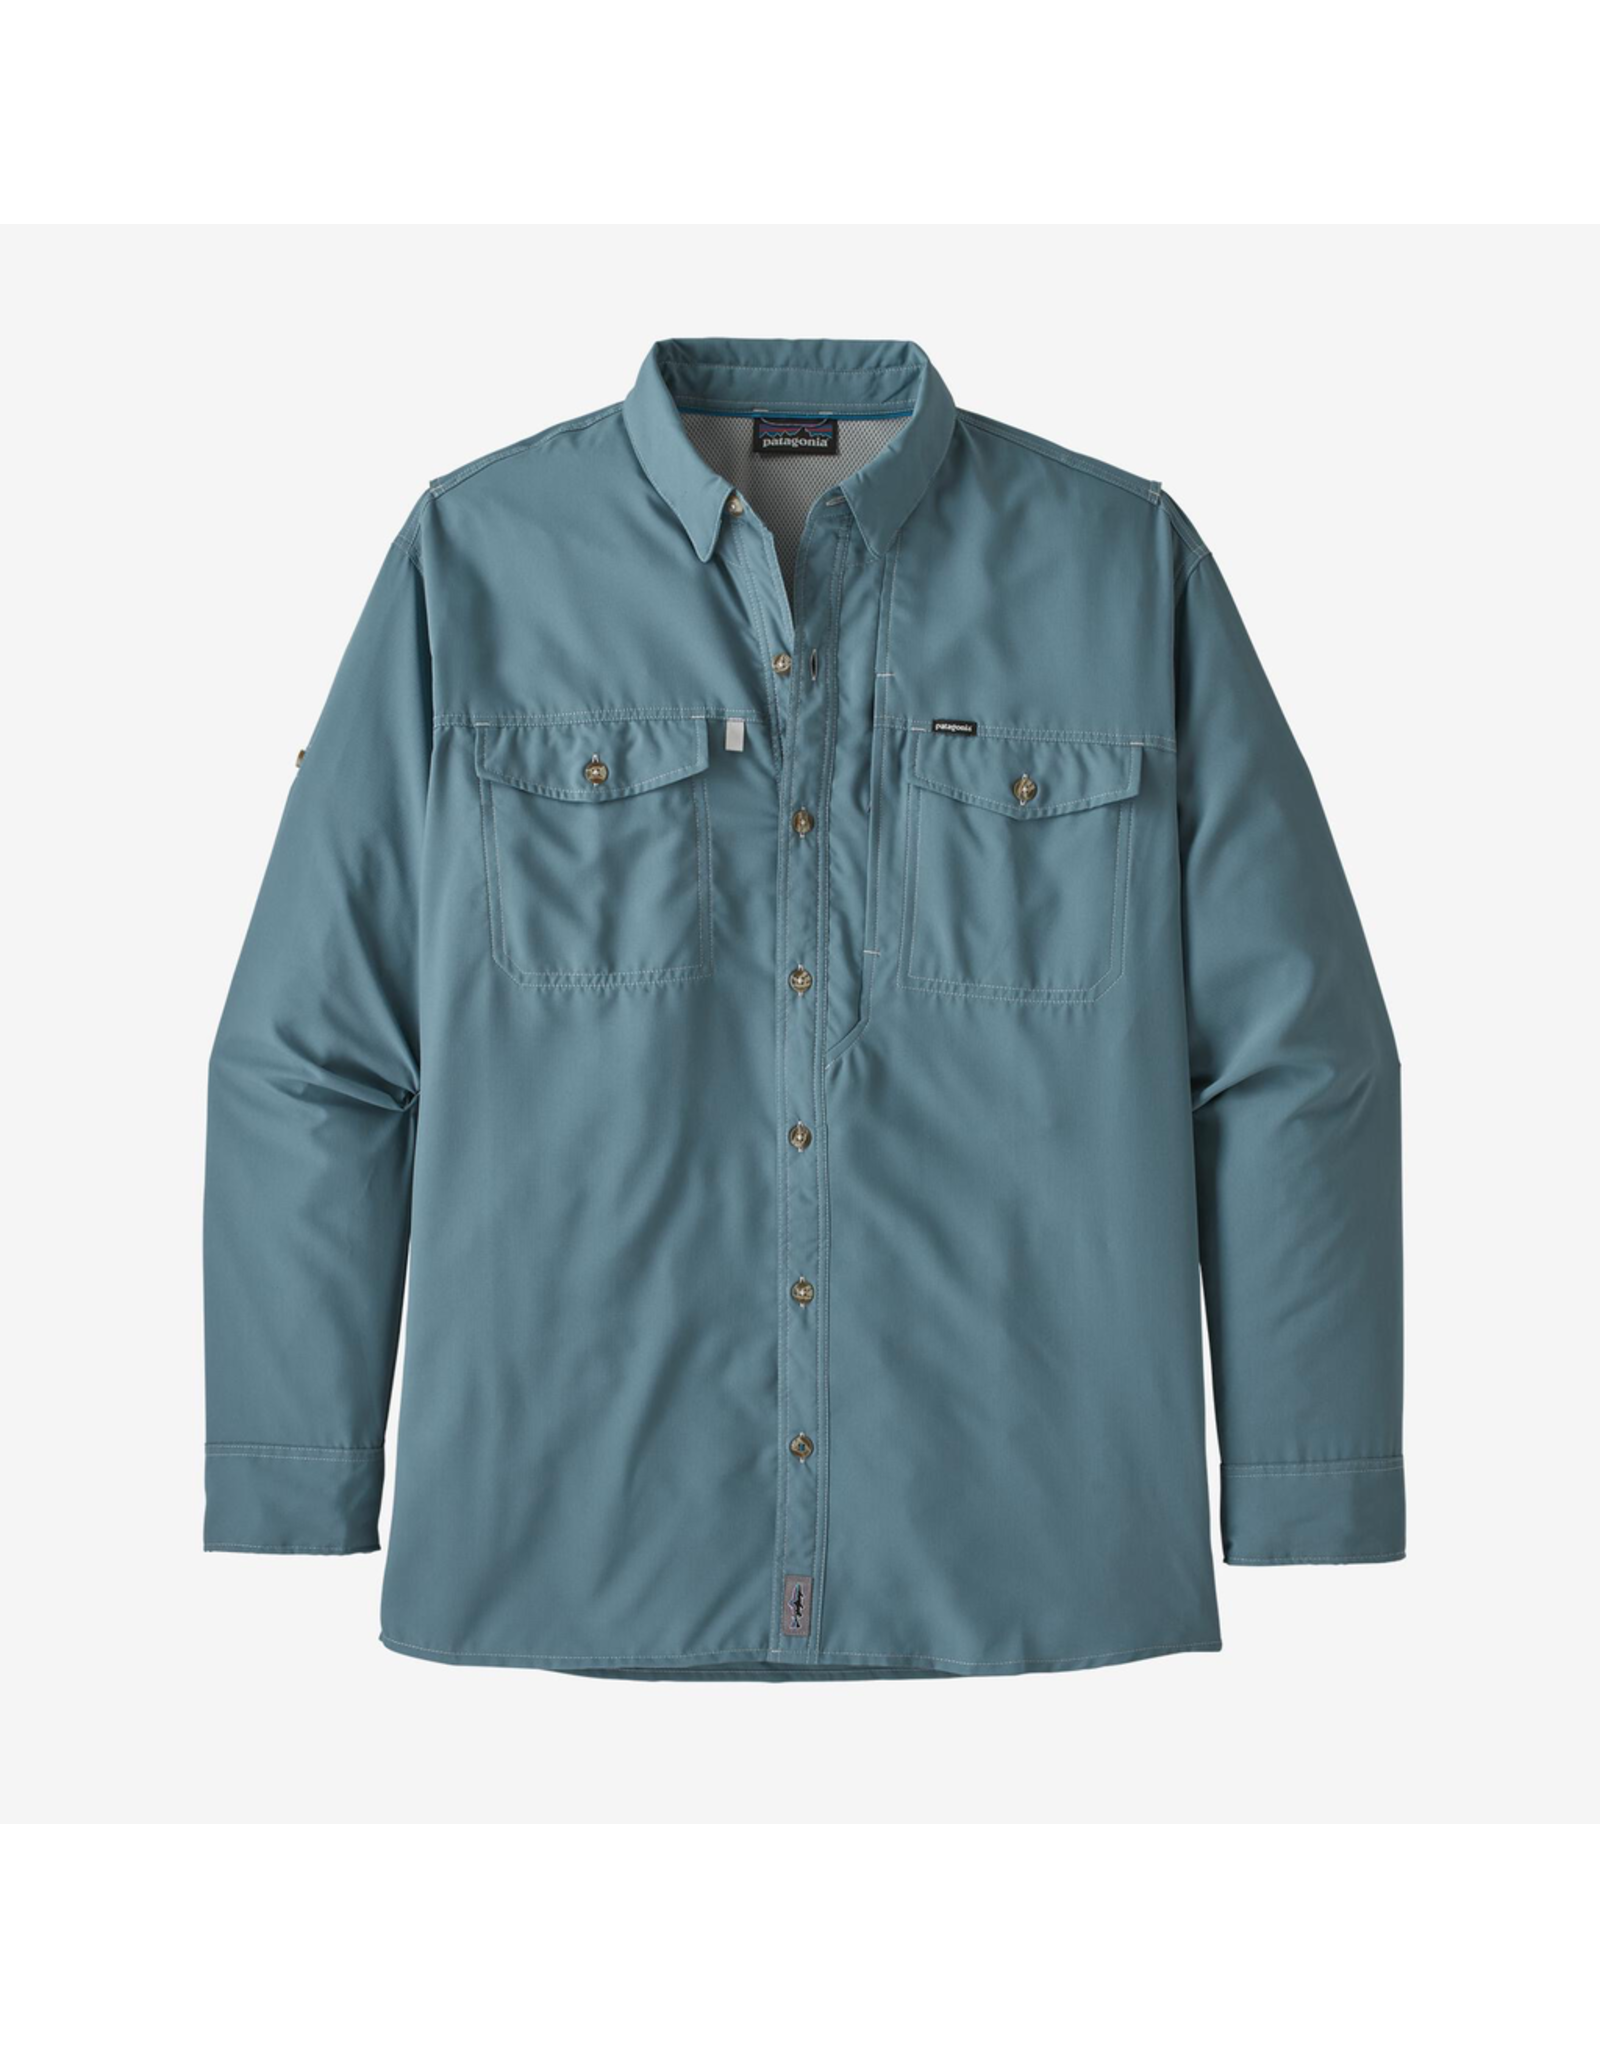 Patagonia Patagonia Sol Patrol  II Men's Long Sleeve Shirt (Pigeon Blue)